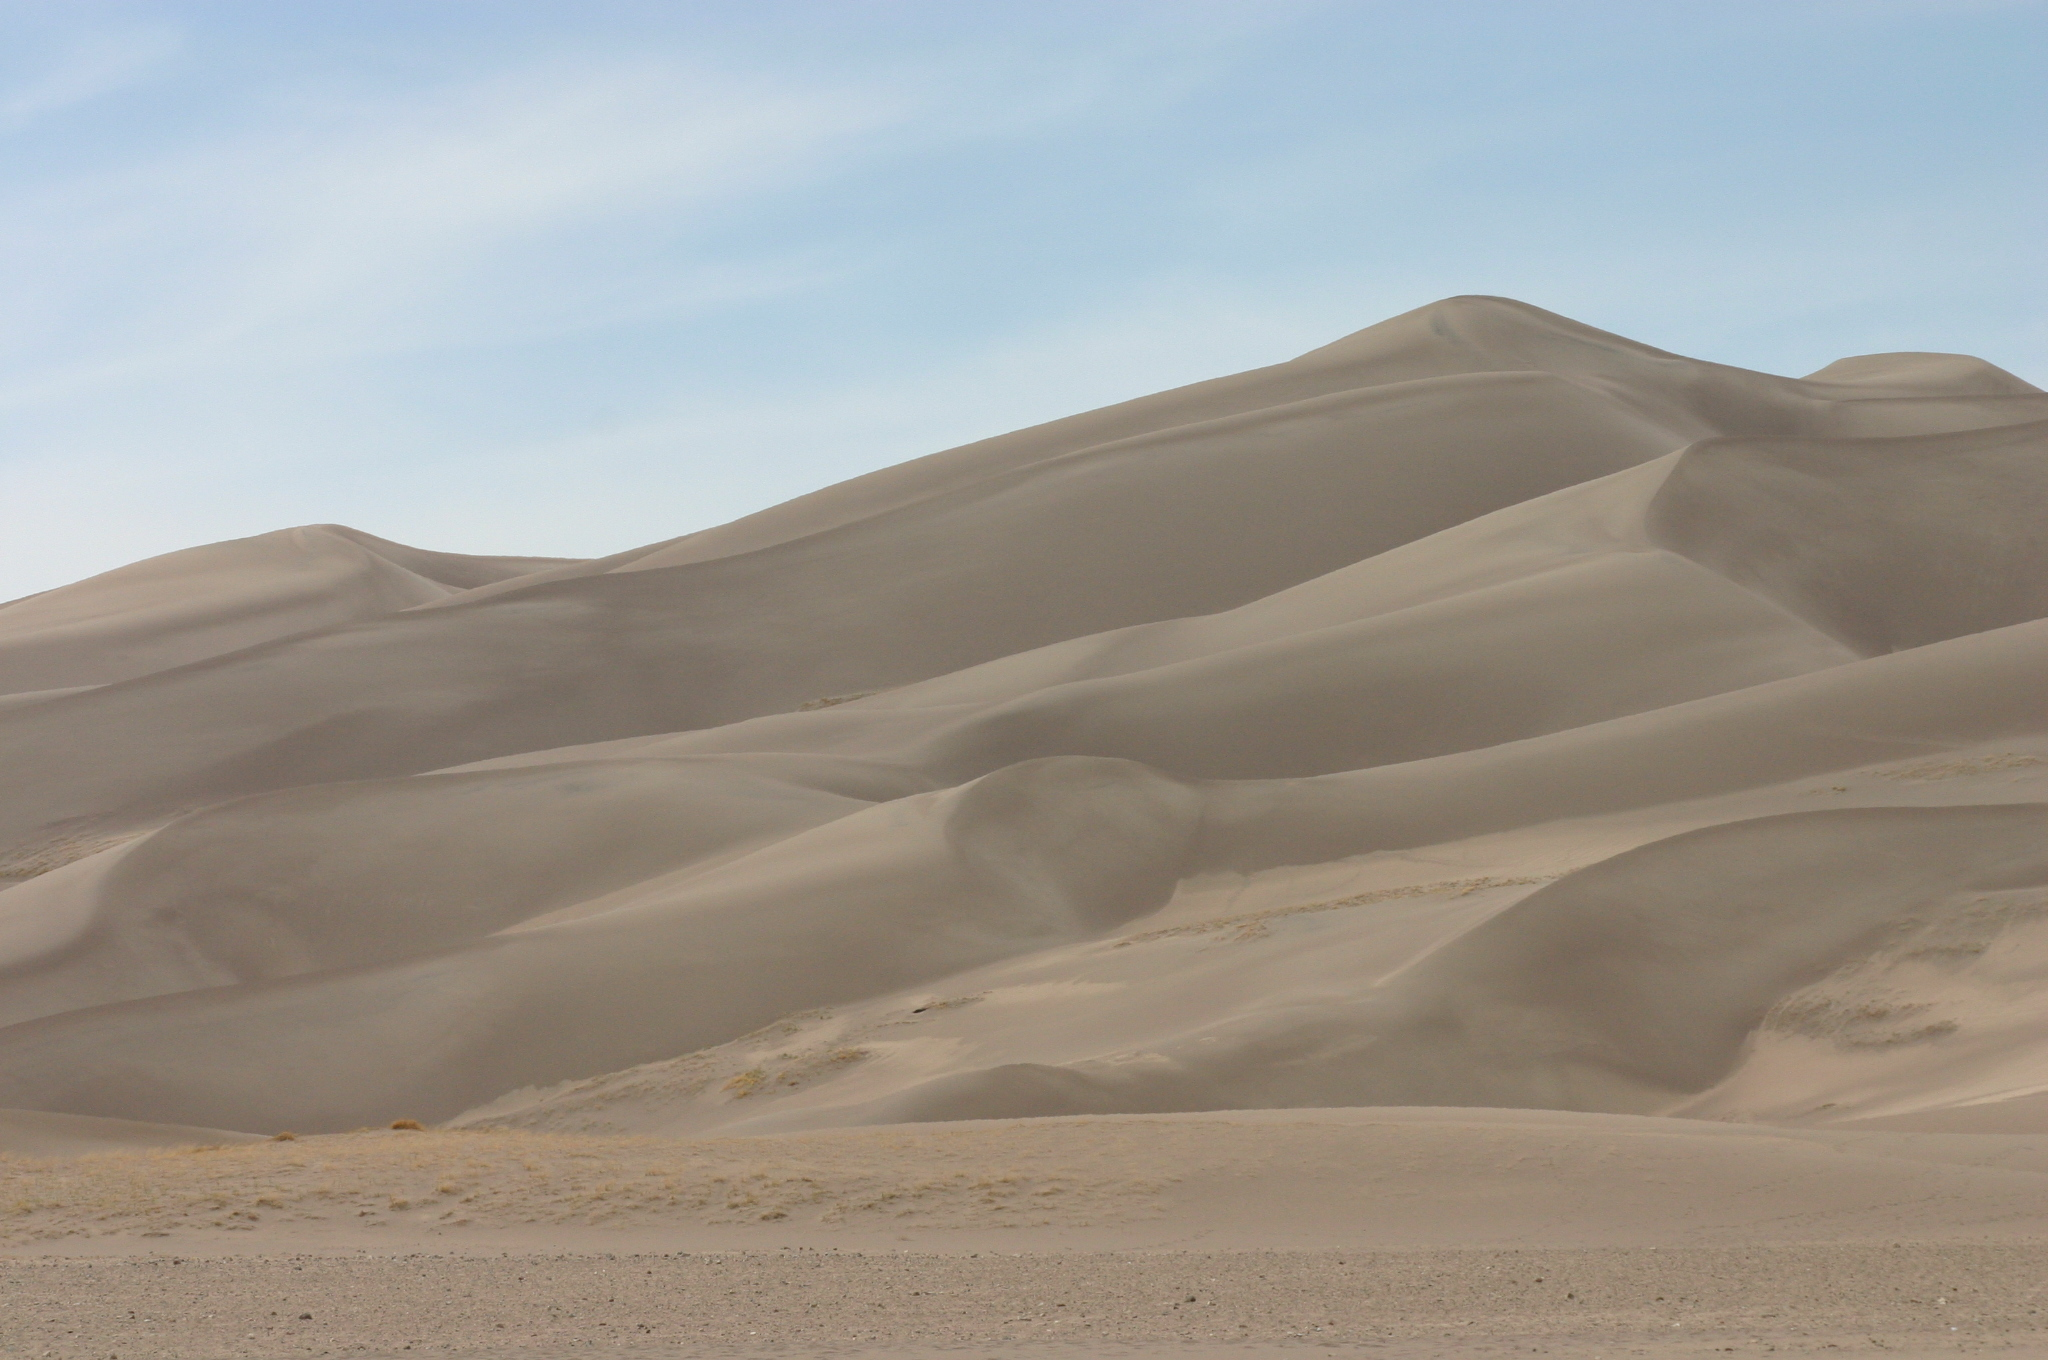 Sand Dunes desert biome